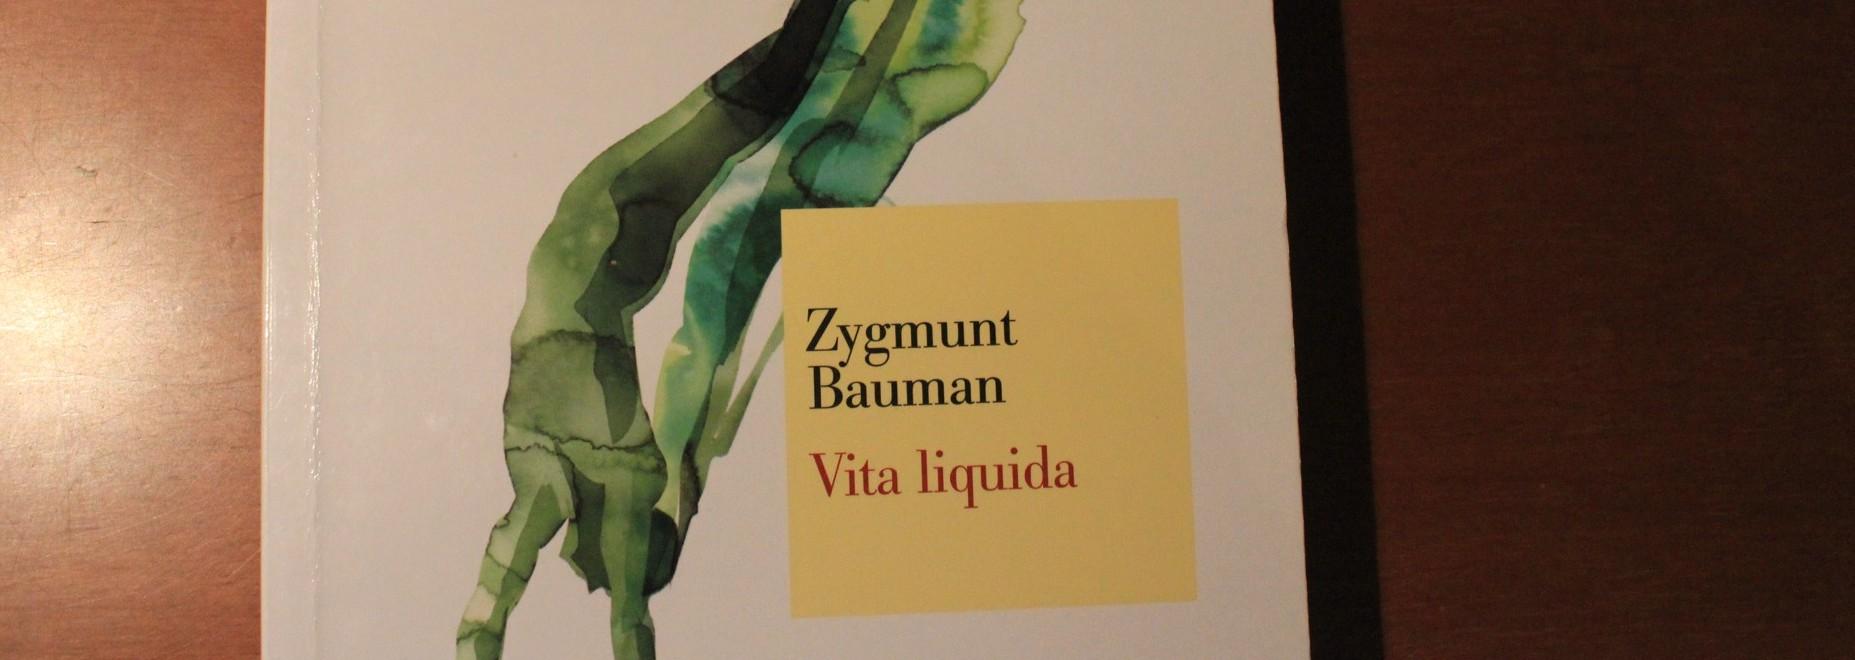 Vita-liquida-bauman